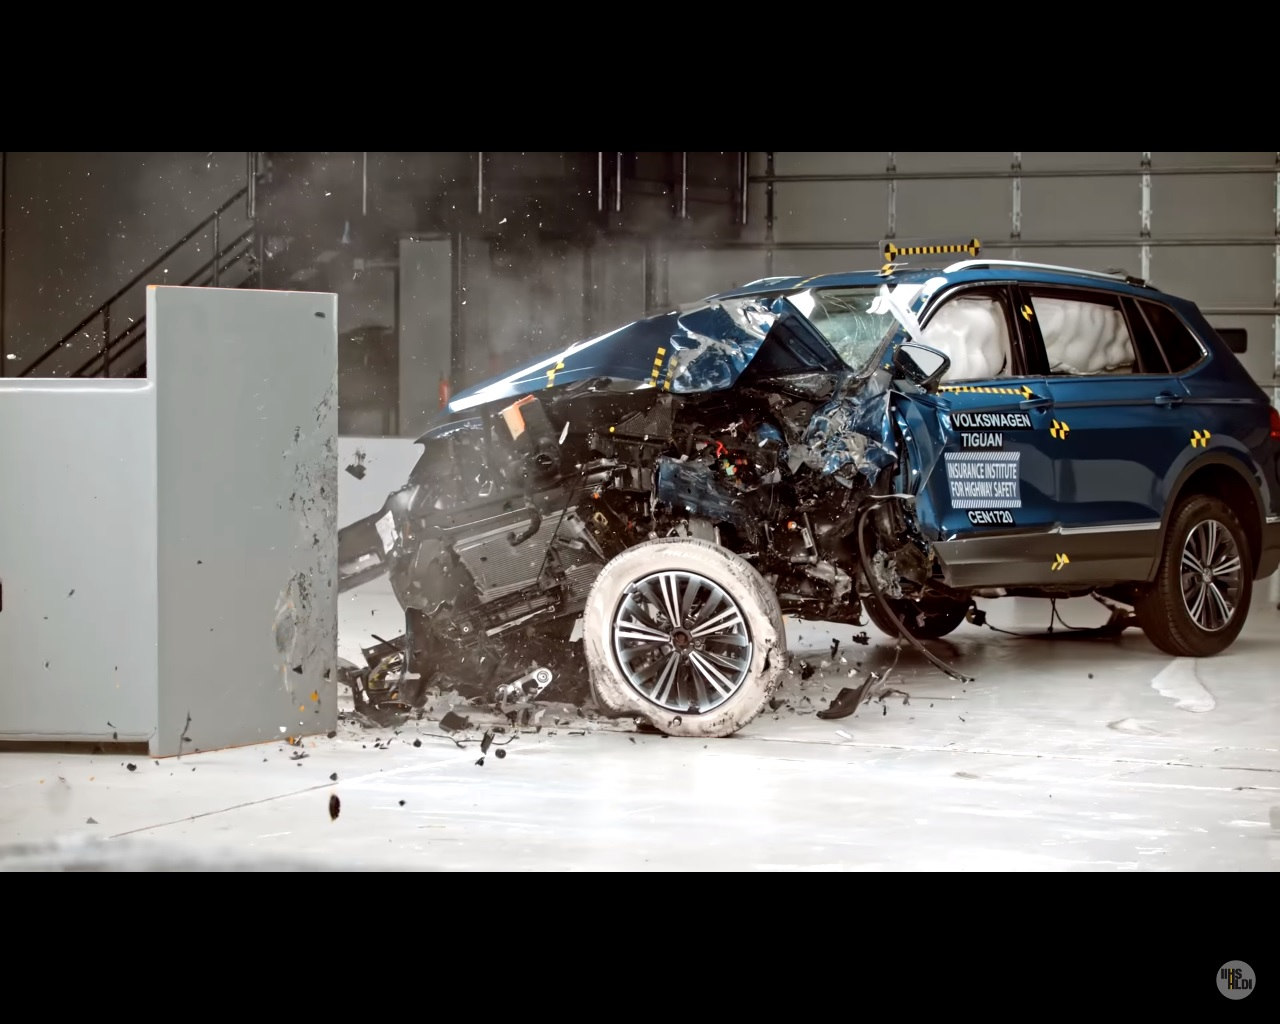 2018 volkswagen tiguan aces iihs crash tests despite bad headlight performance autoevolution. Black Bedroom Furniture Sets. Home Design Ideas